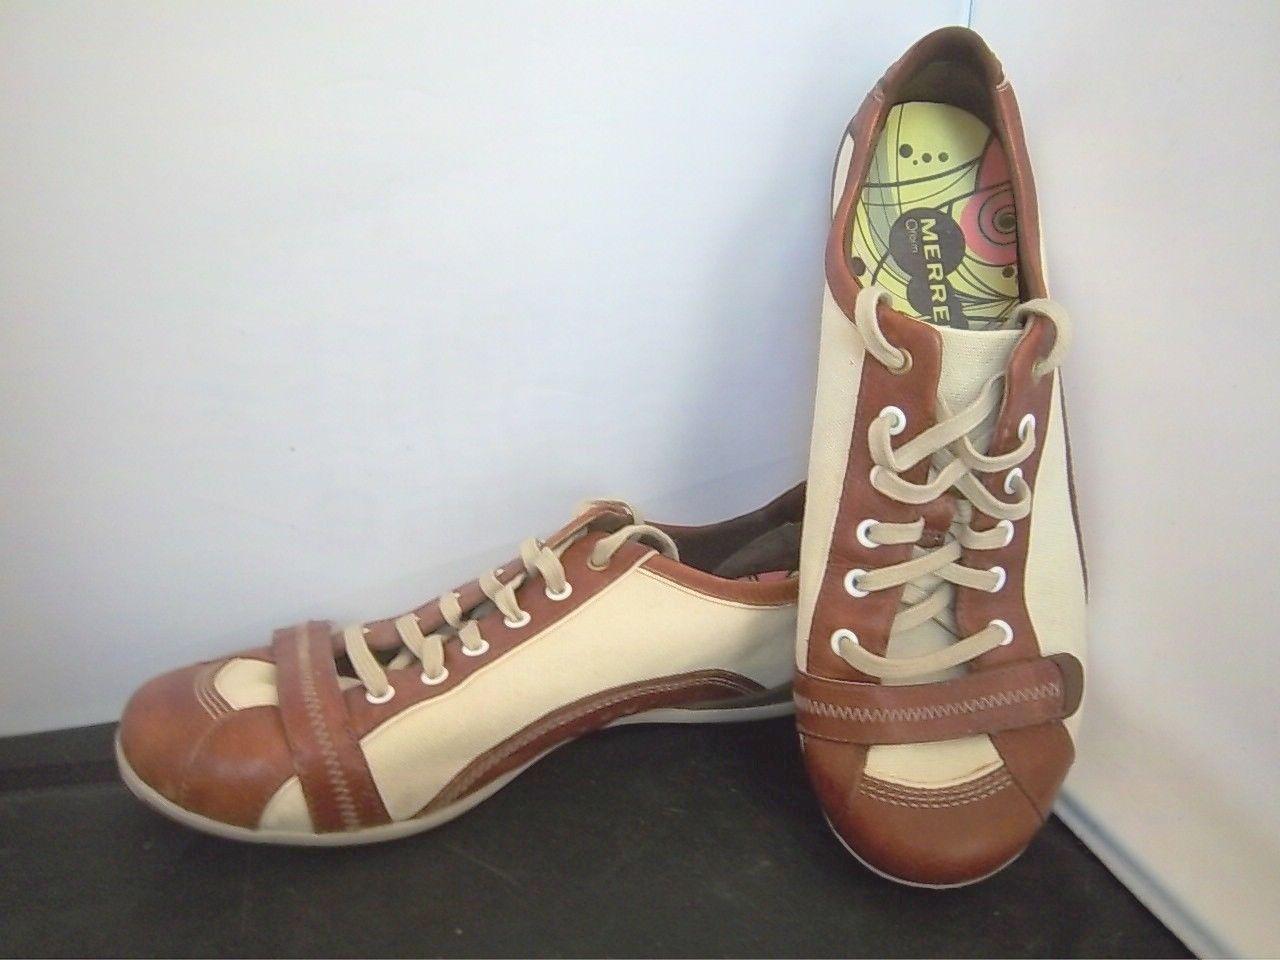 MERRELL - Women's Beige Tan Pirouette Canvas Leather Walking shoes - SIZE 8